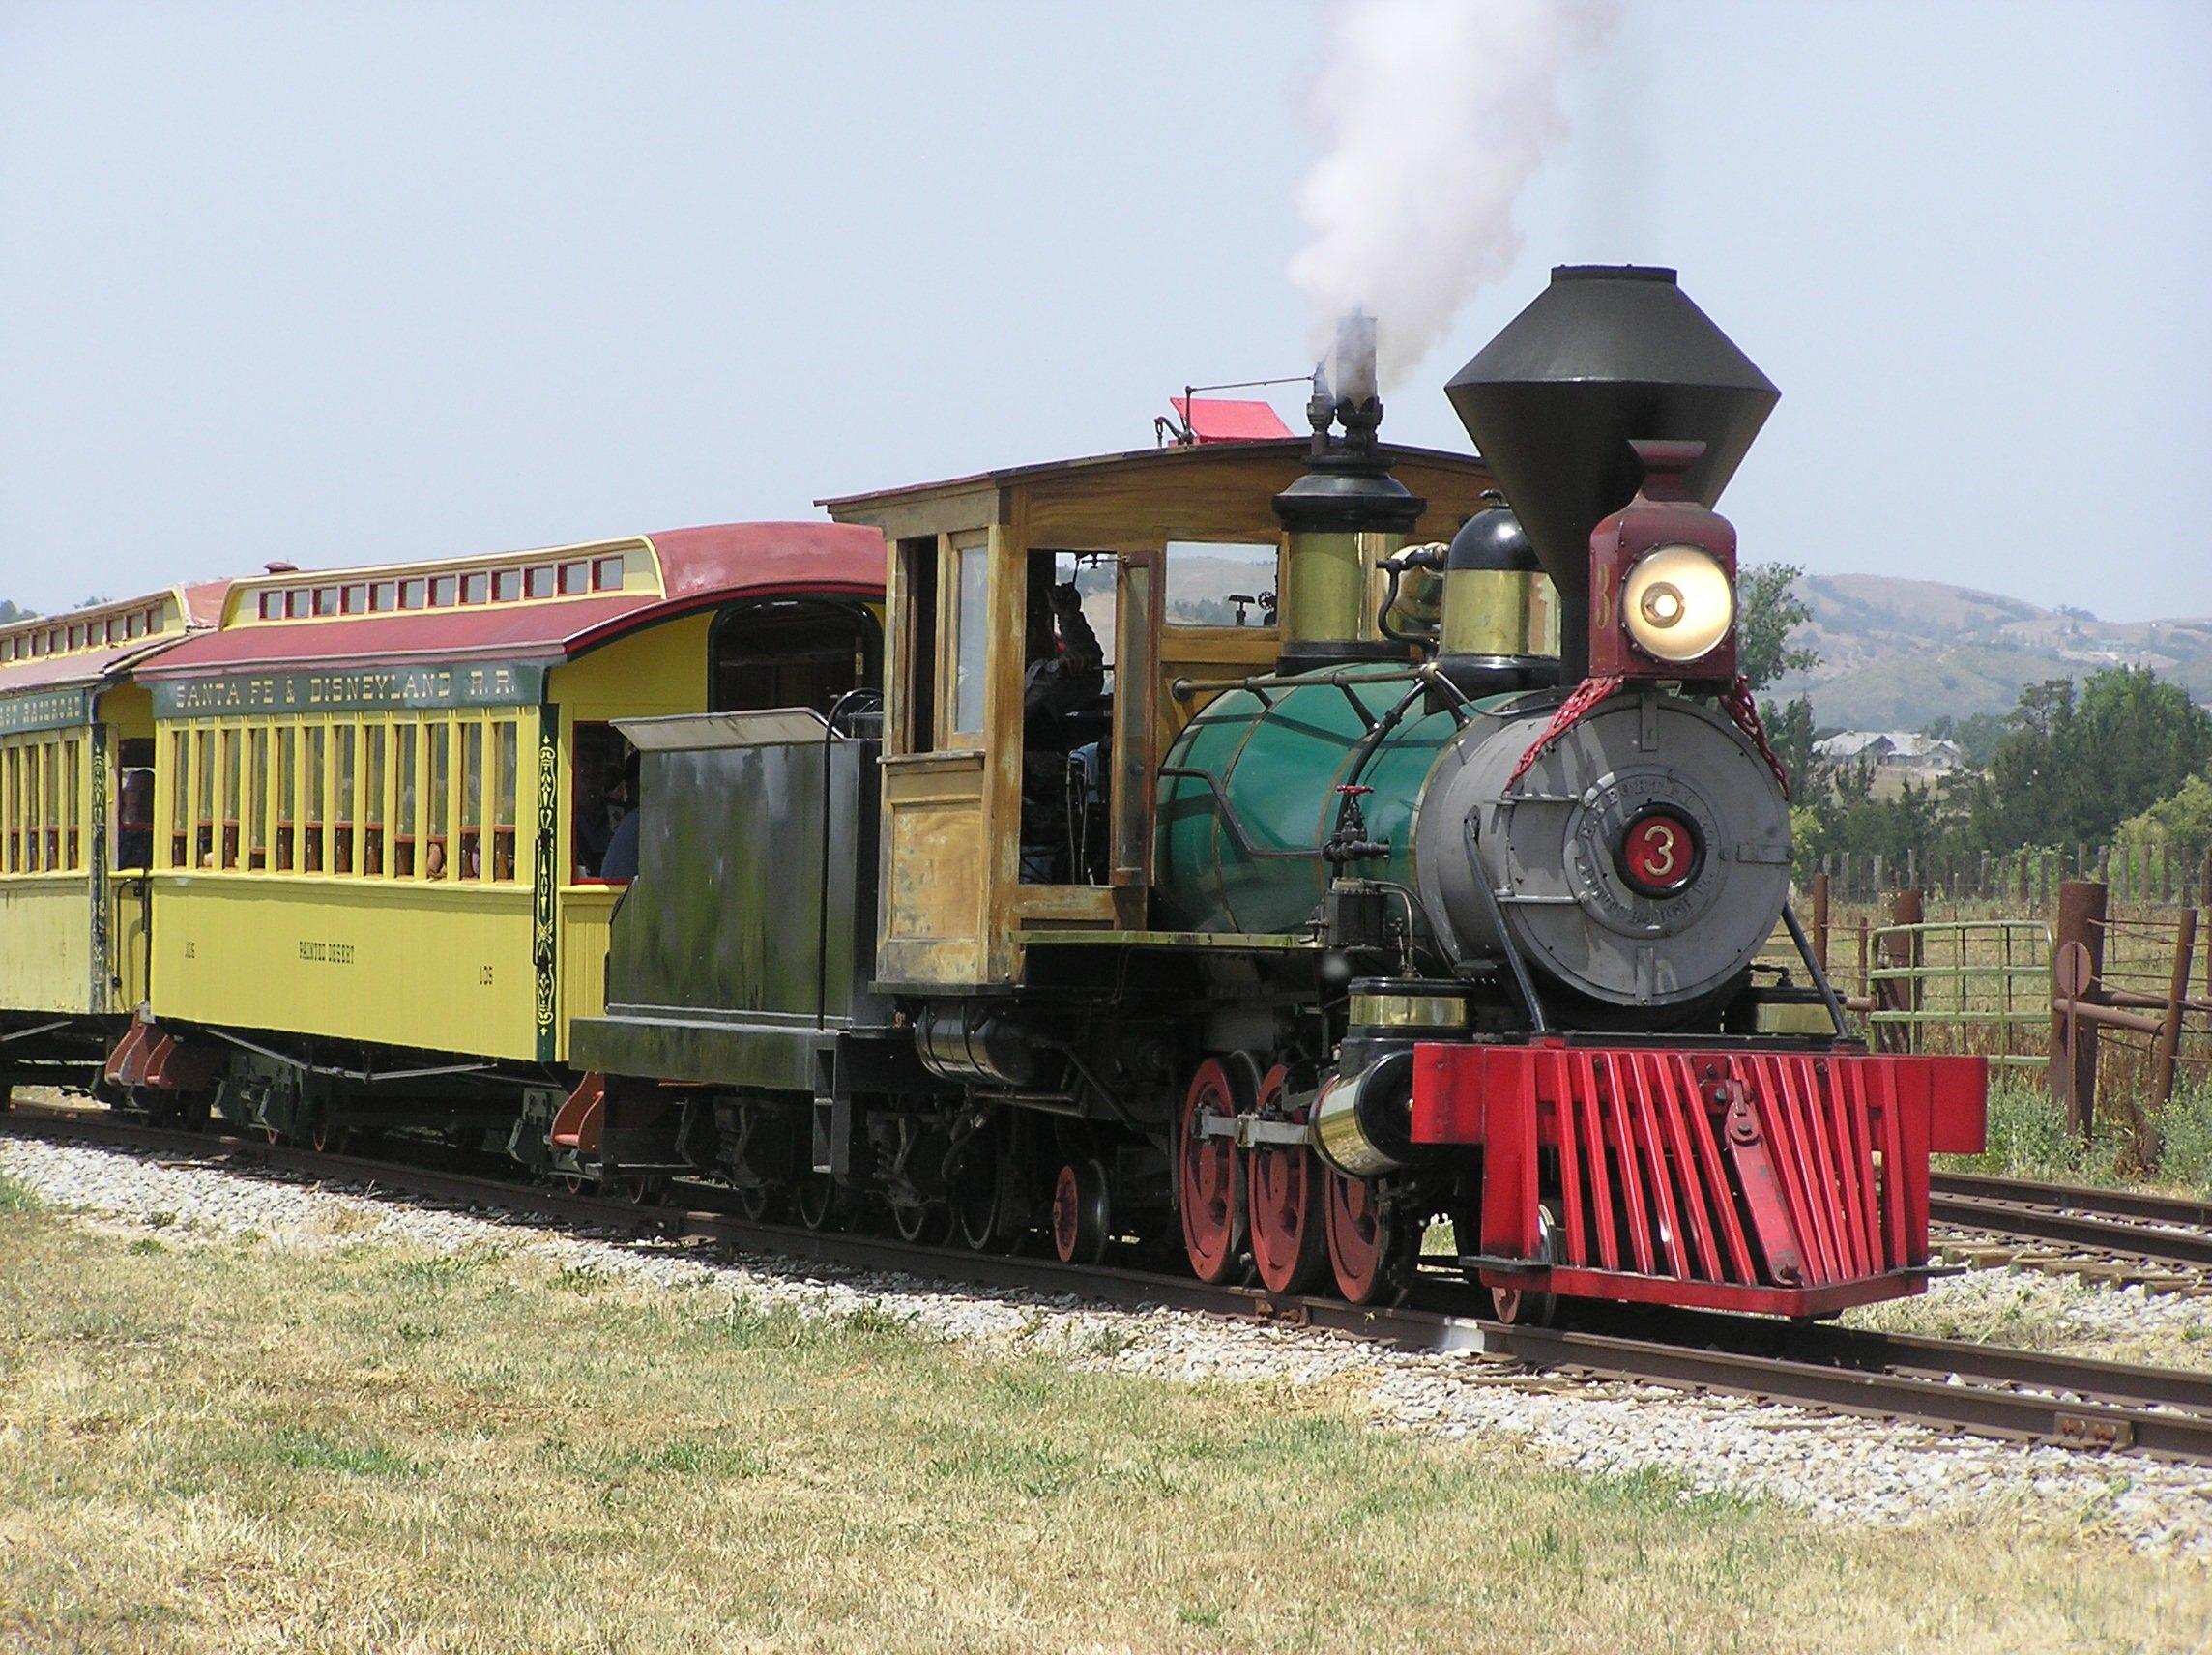 Pacific Coast Railroad Roundup Adds Vintage Steam Engines   TrainTalk.TV